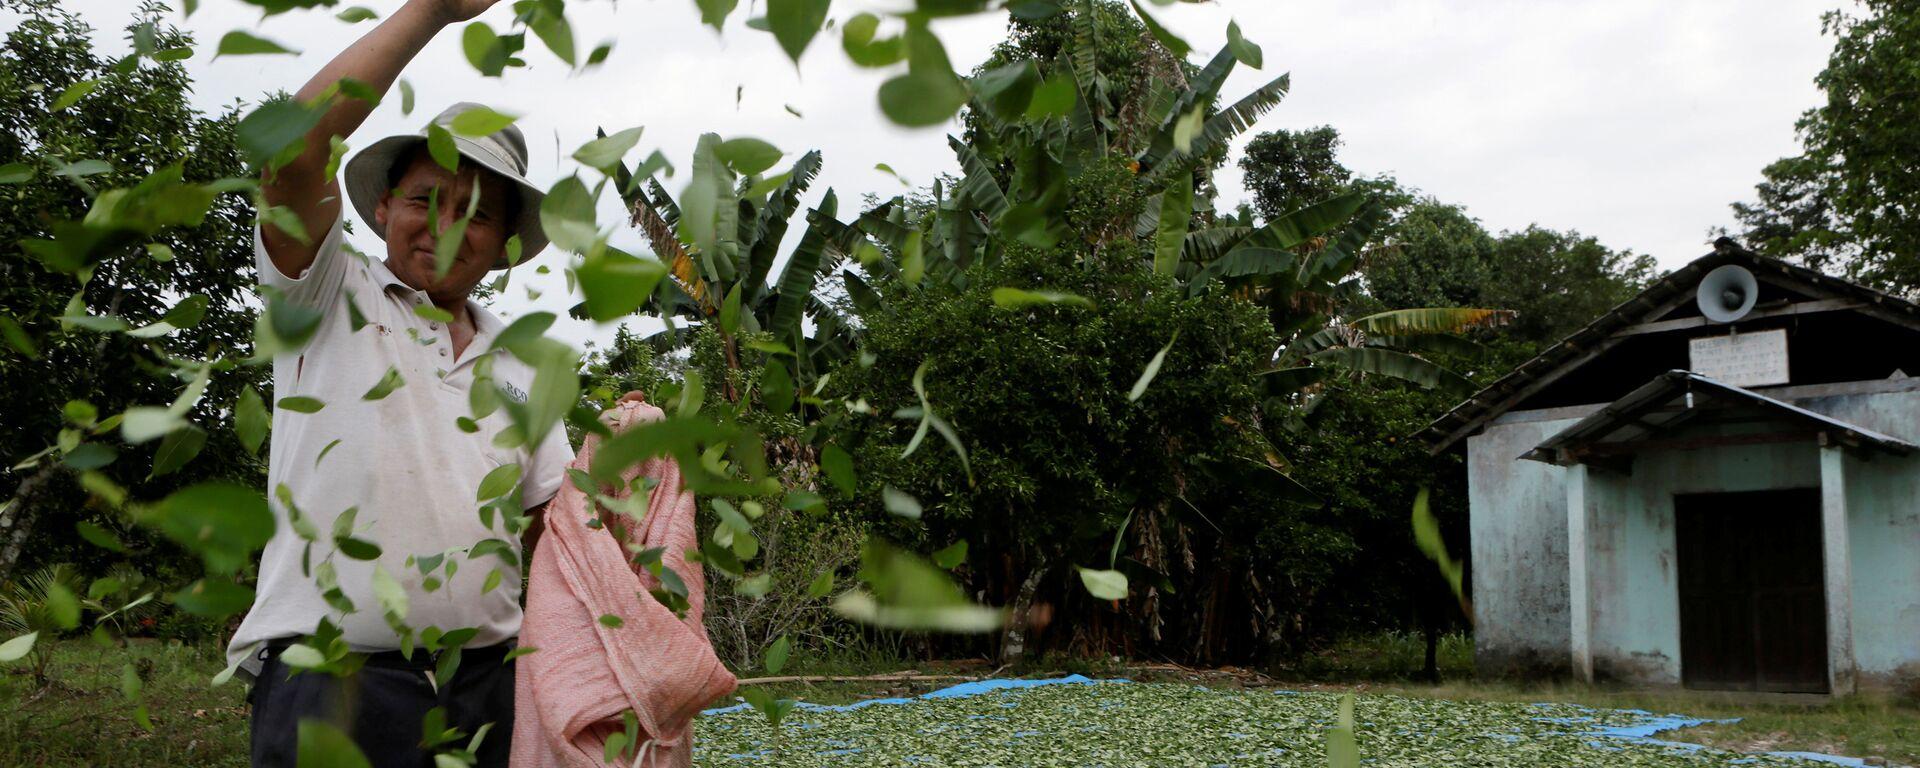 A man spreads coca leaves on the ground to be sun dried outside a church in President Evo Morales' hometown of Villa 14 de Septiembre in the Chapare region in Cochabamba - Sputnik Mundo, 1920, 02.06.2021